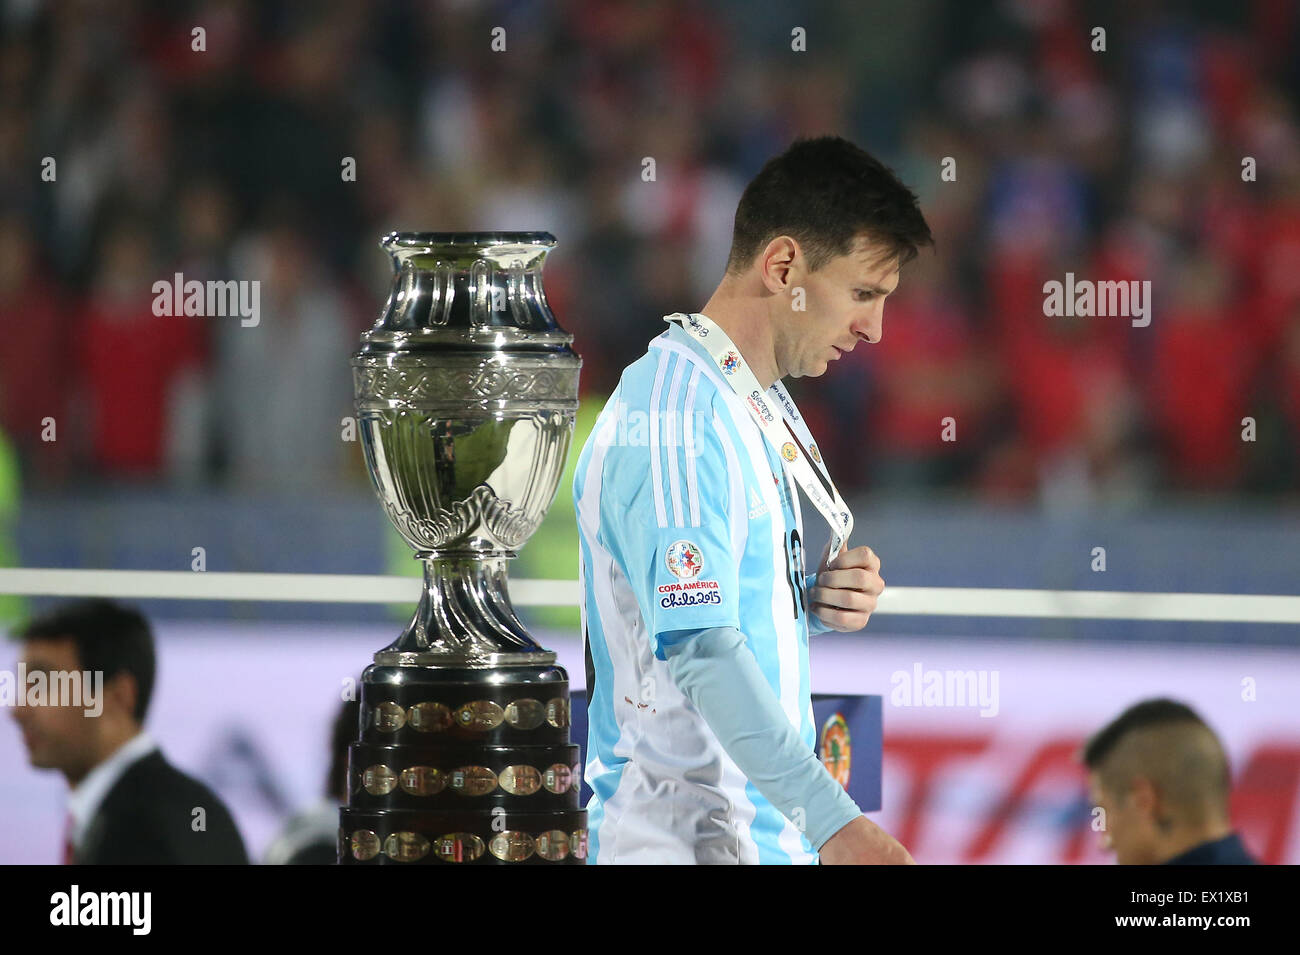 Argentinas Lionel Messi Walks Past The Trophy